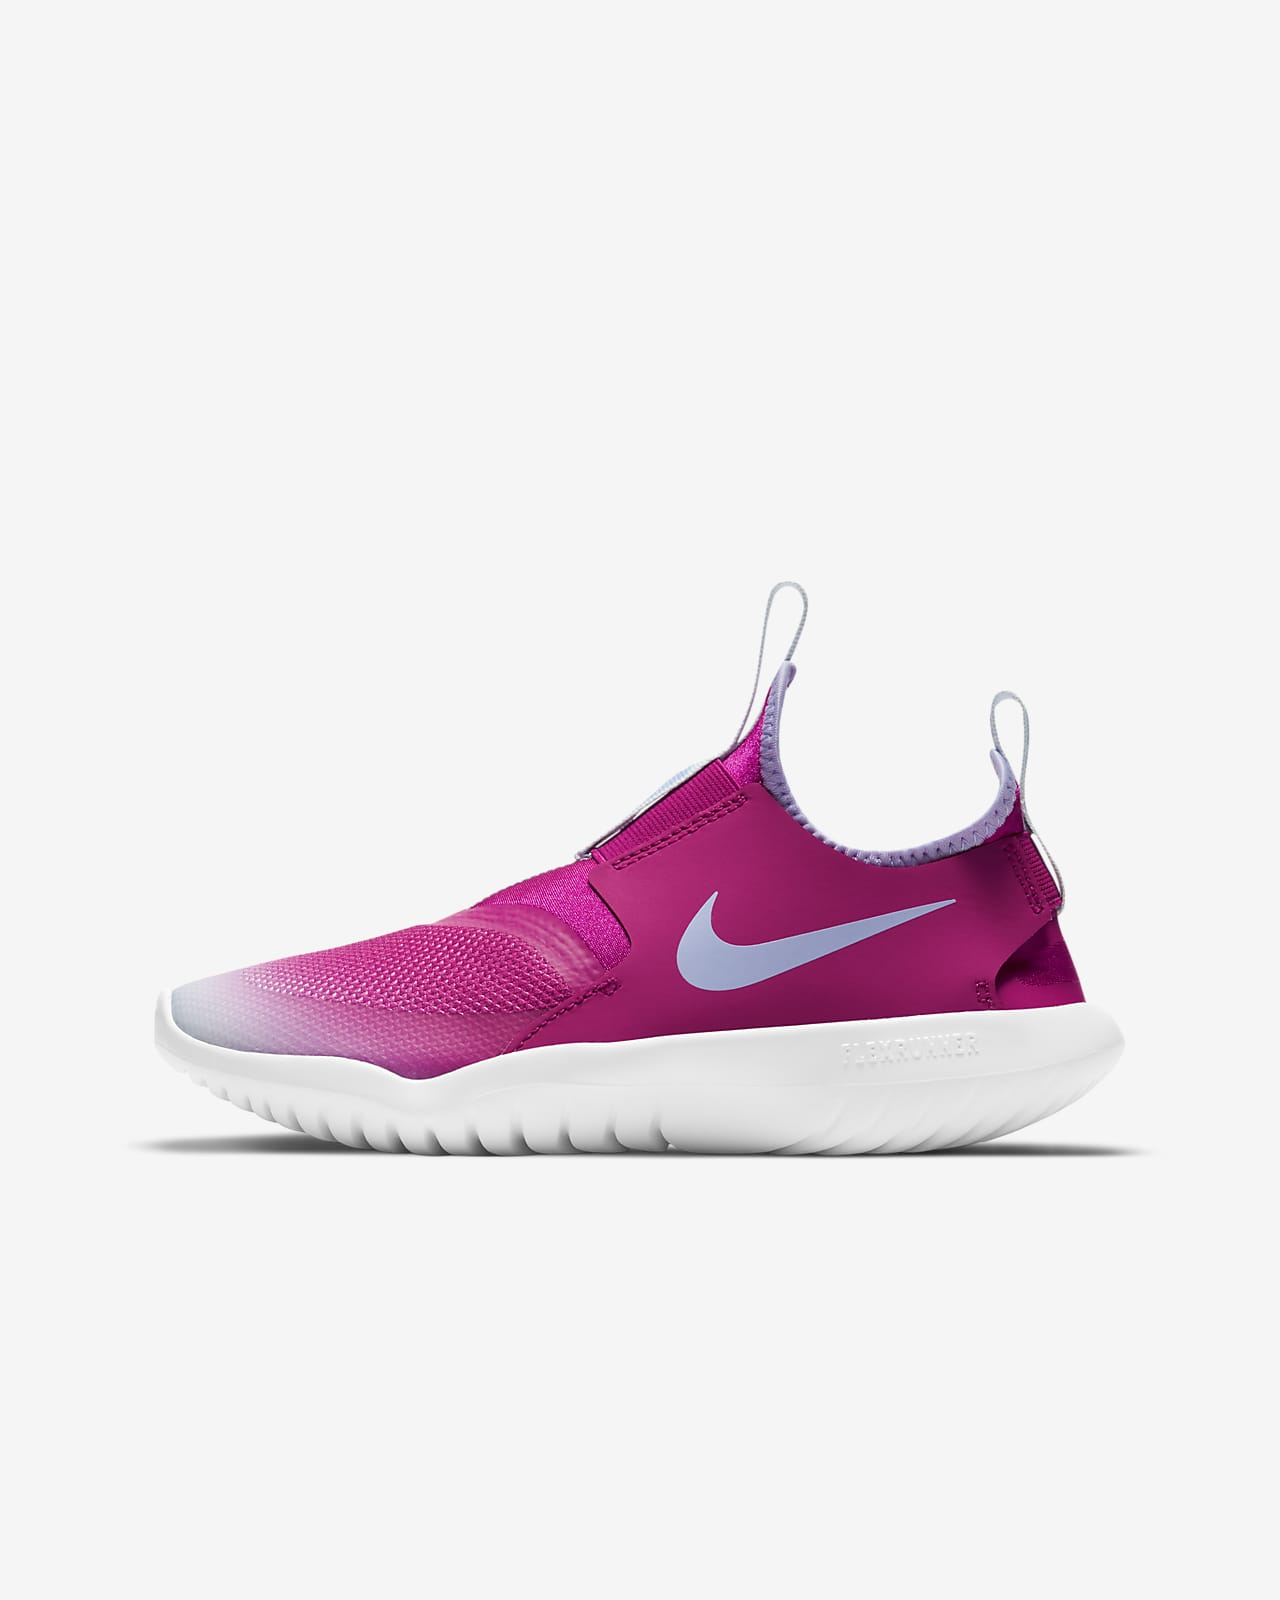 Calzado de running para niños talla grande Nike Flex Runner